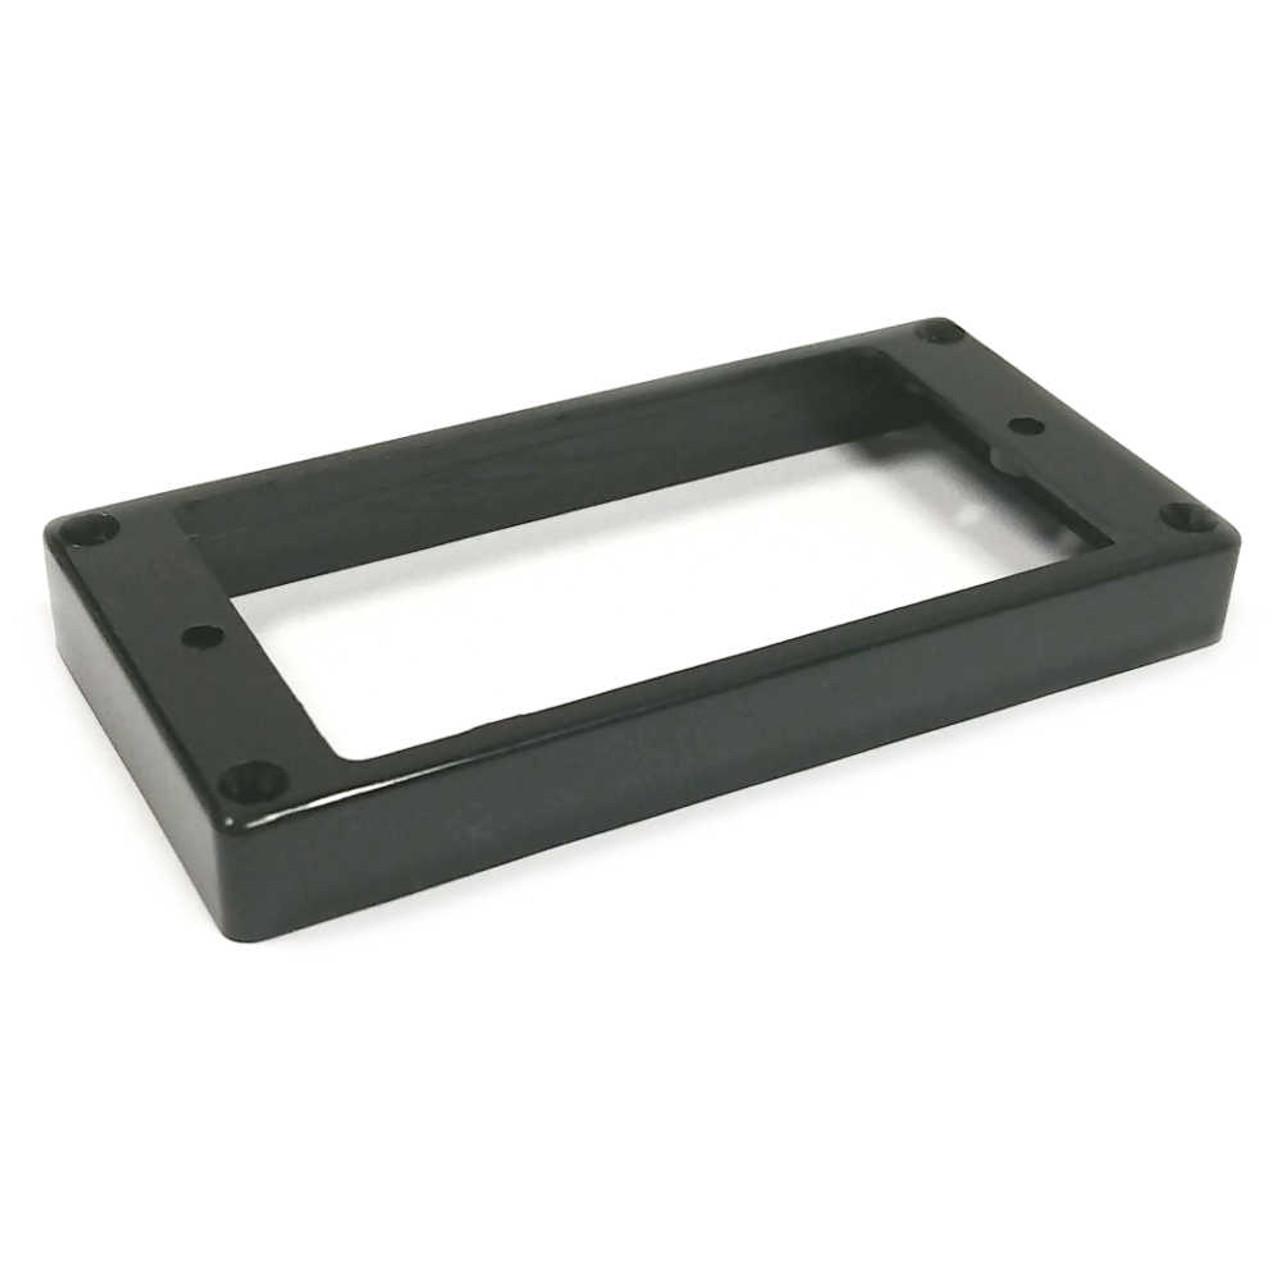 Humbucker Mounting Ring - Flat/Slanted Tall - Black